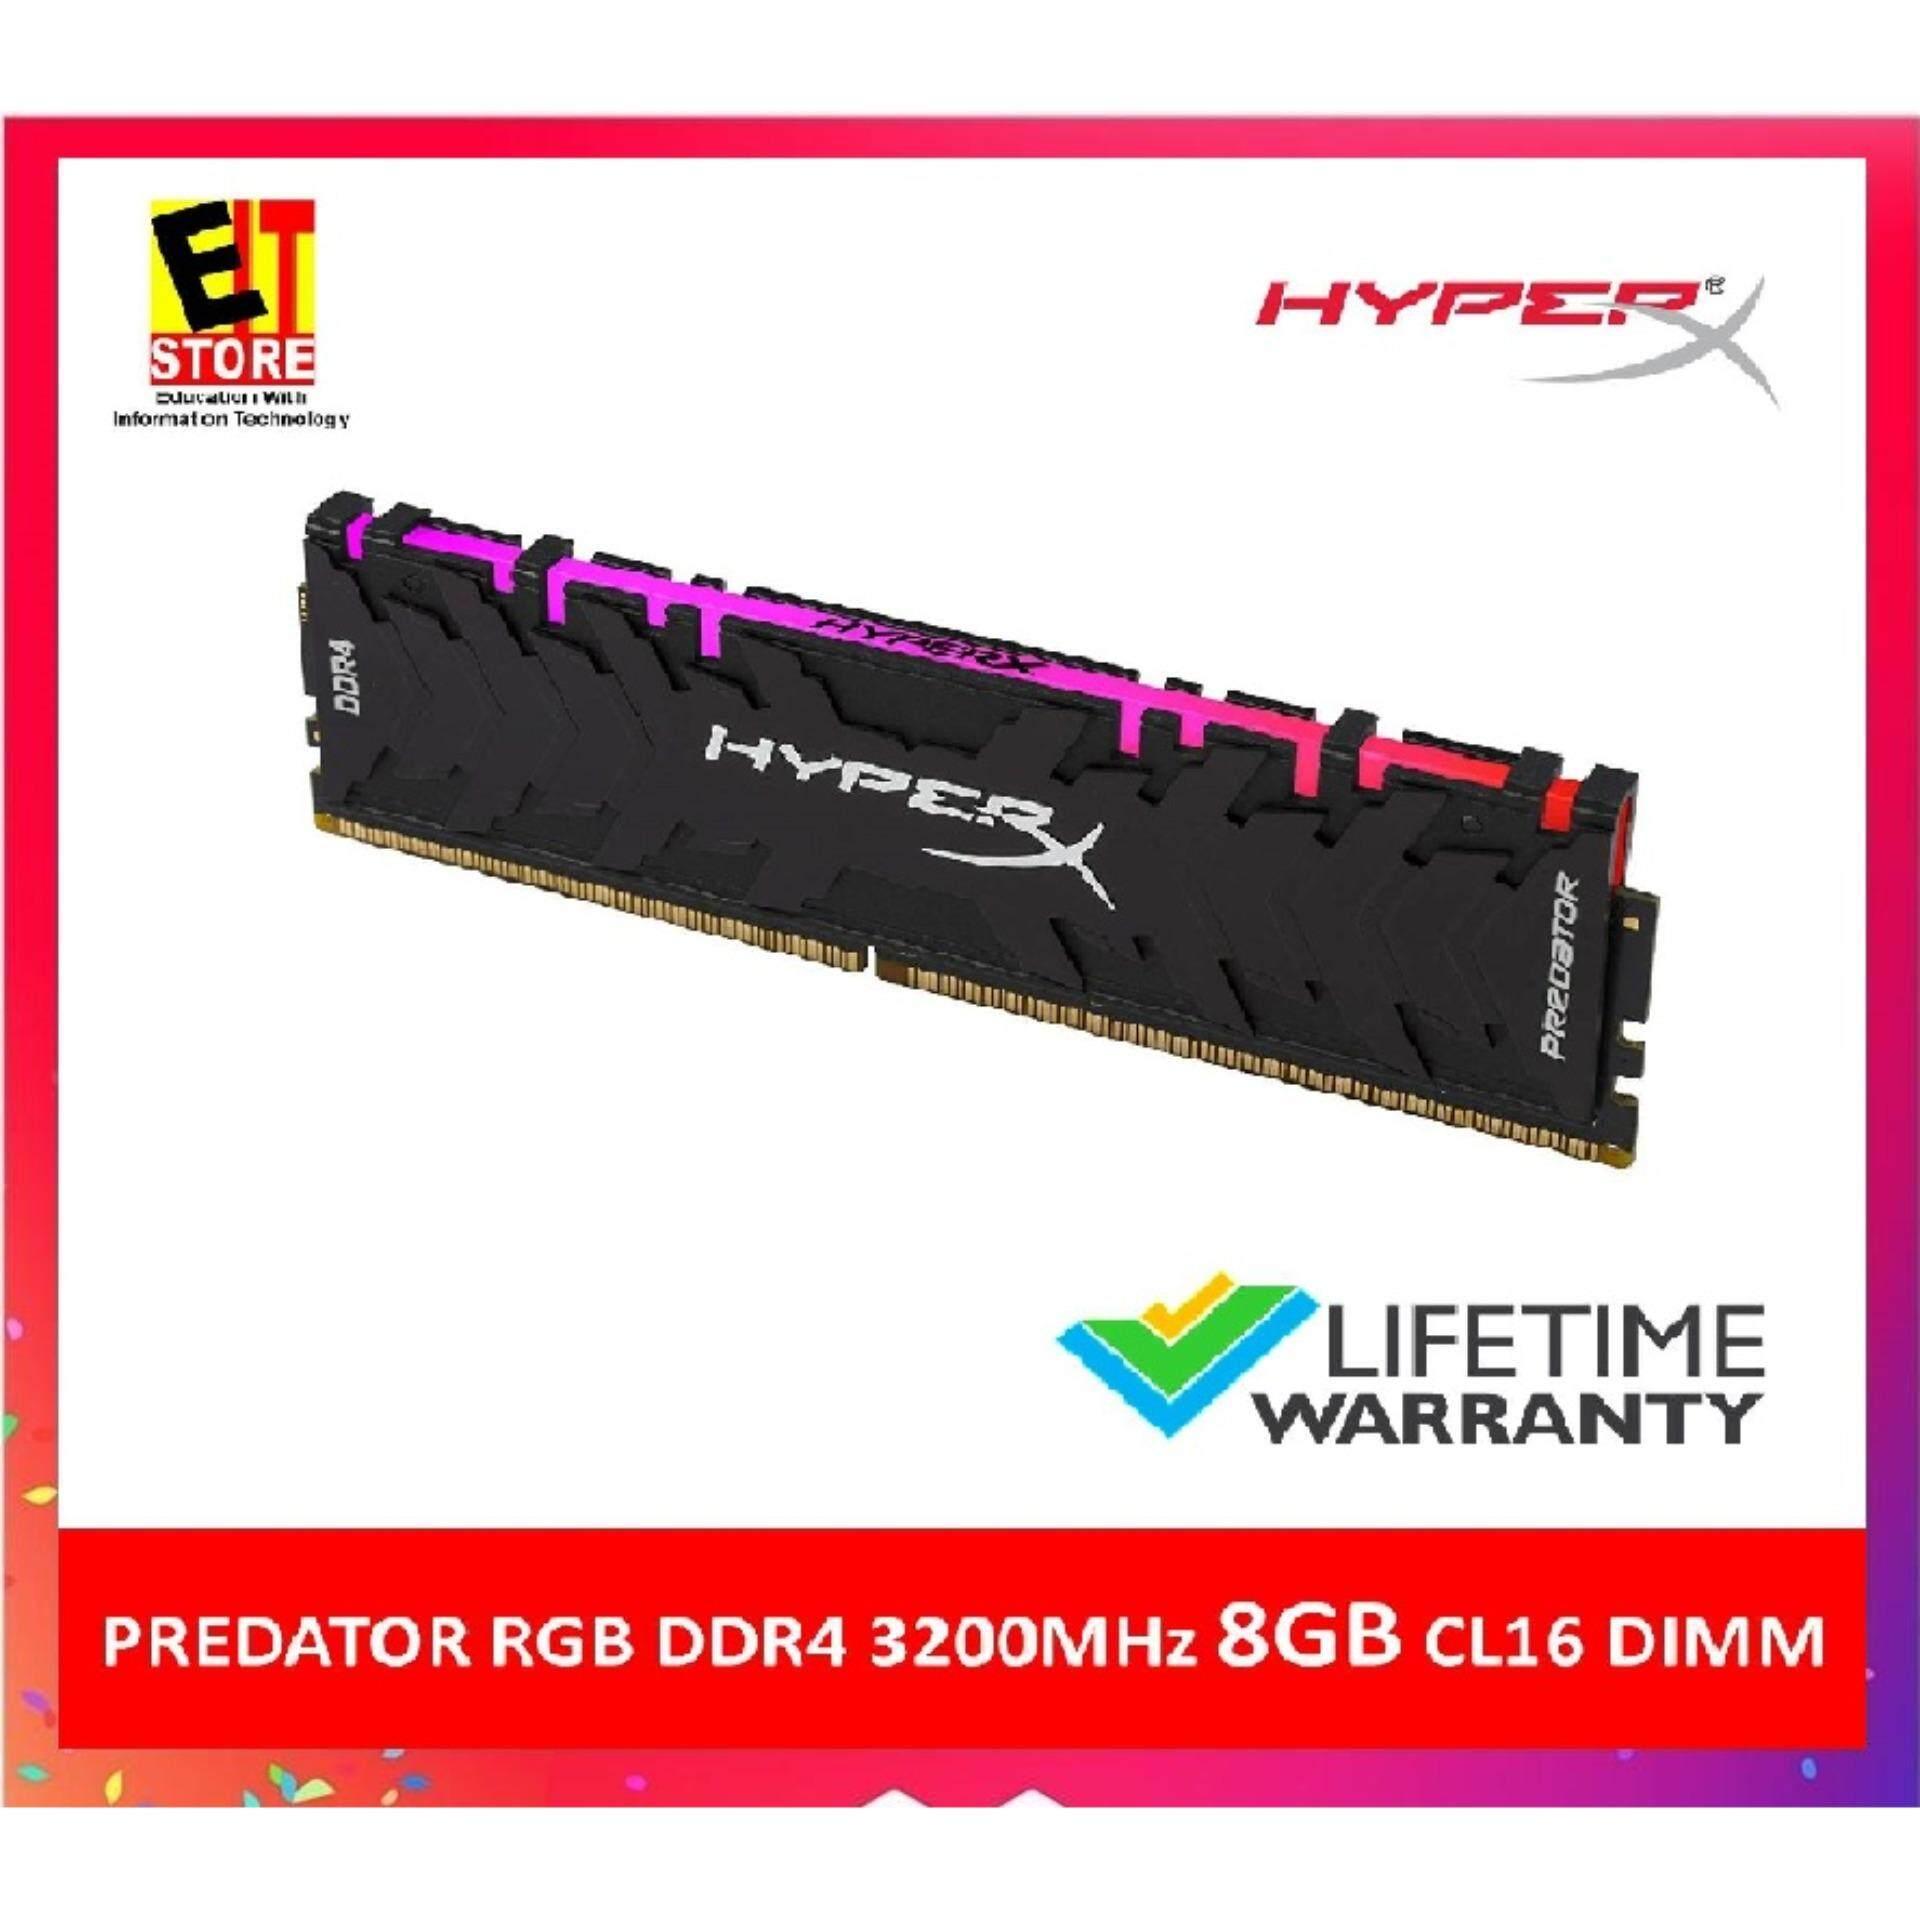 Computer Laptop Ram With Best Online Price In Malaysia Ddr2 1gb Pc 6400 Dan 5300 Hyperx Predator Rgb 8gb Ddr4 3200mhz Gaming 1g X 64 Bit Cl16 288 Pin